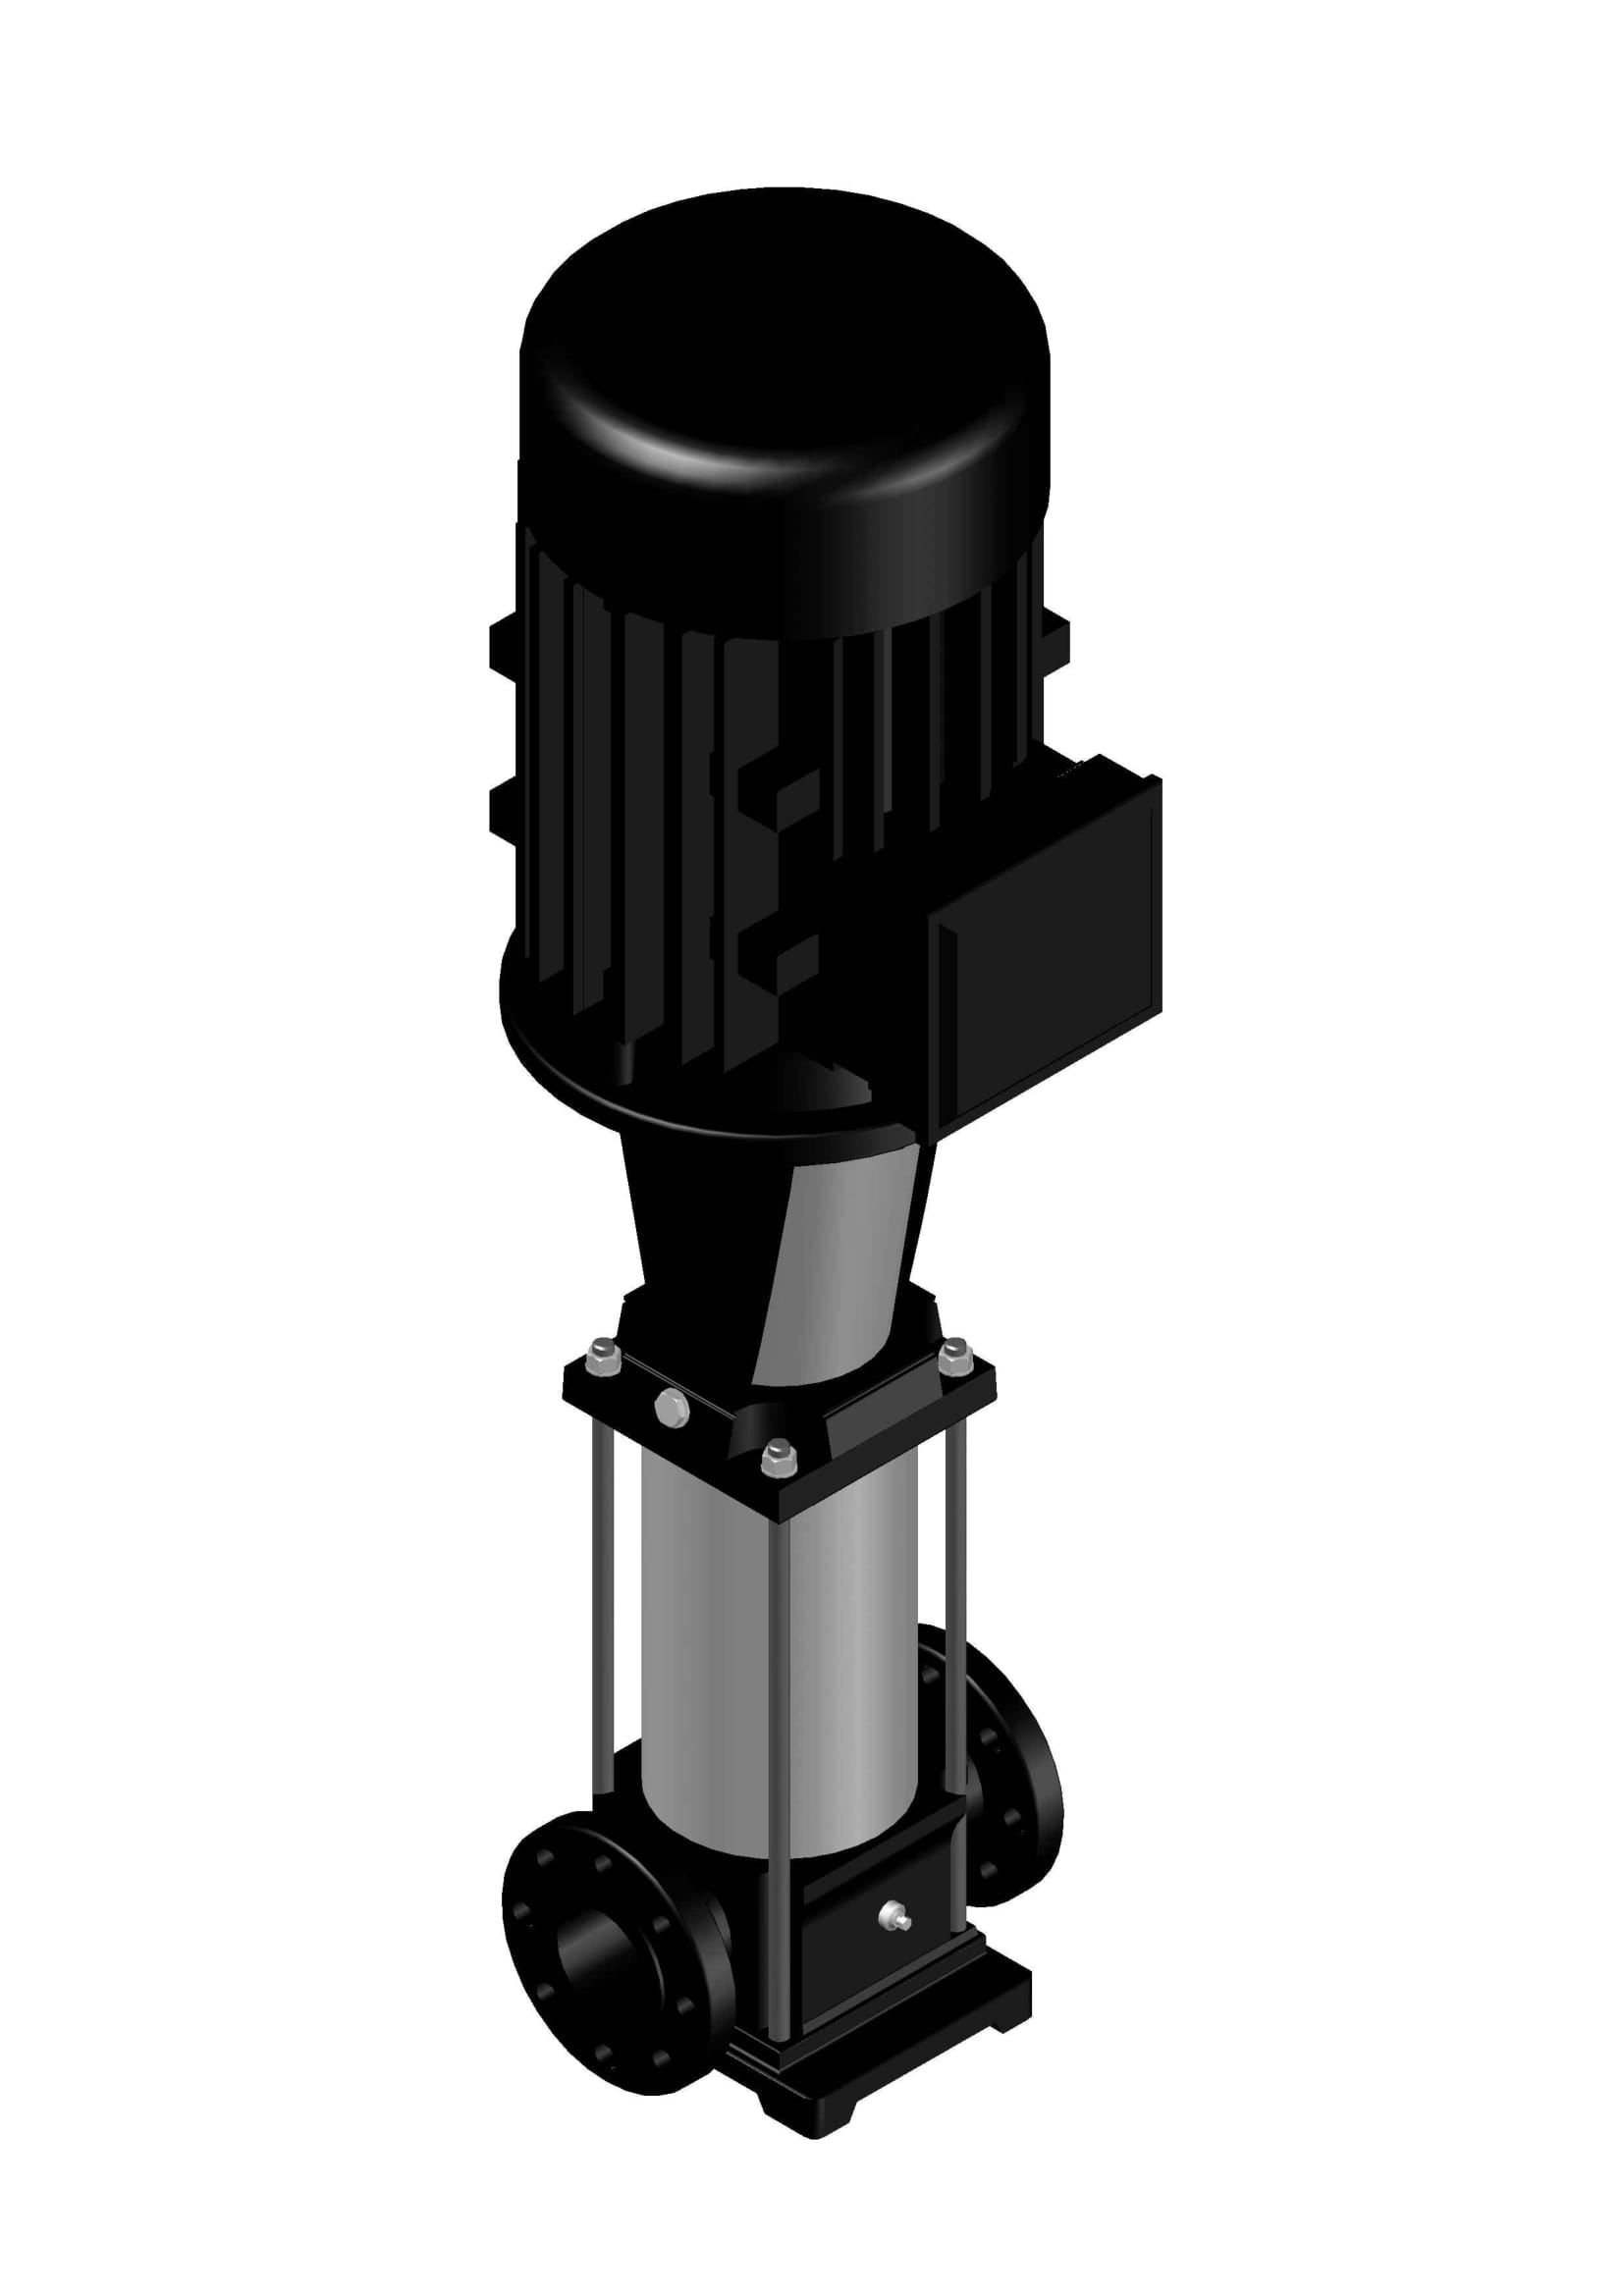 BV 90-04